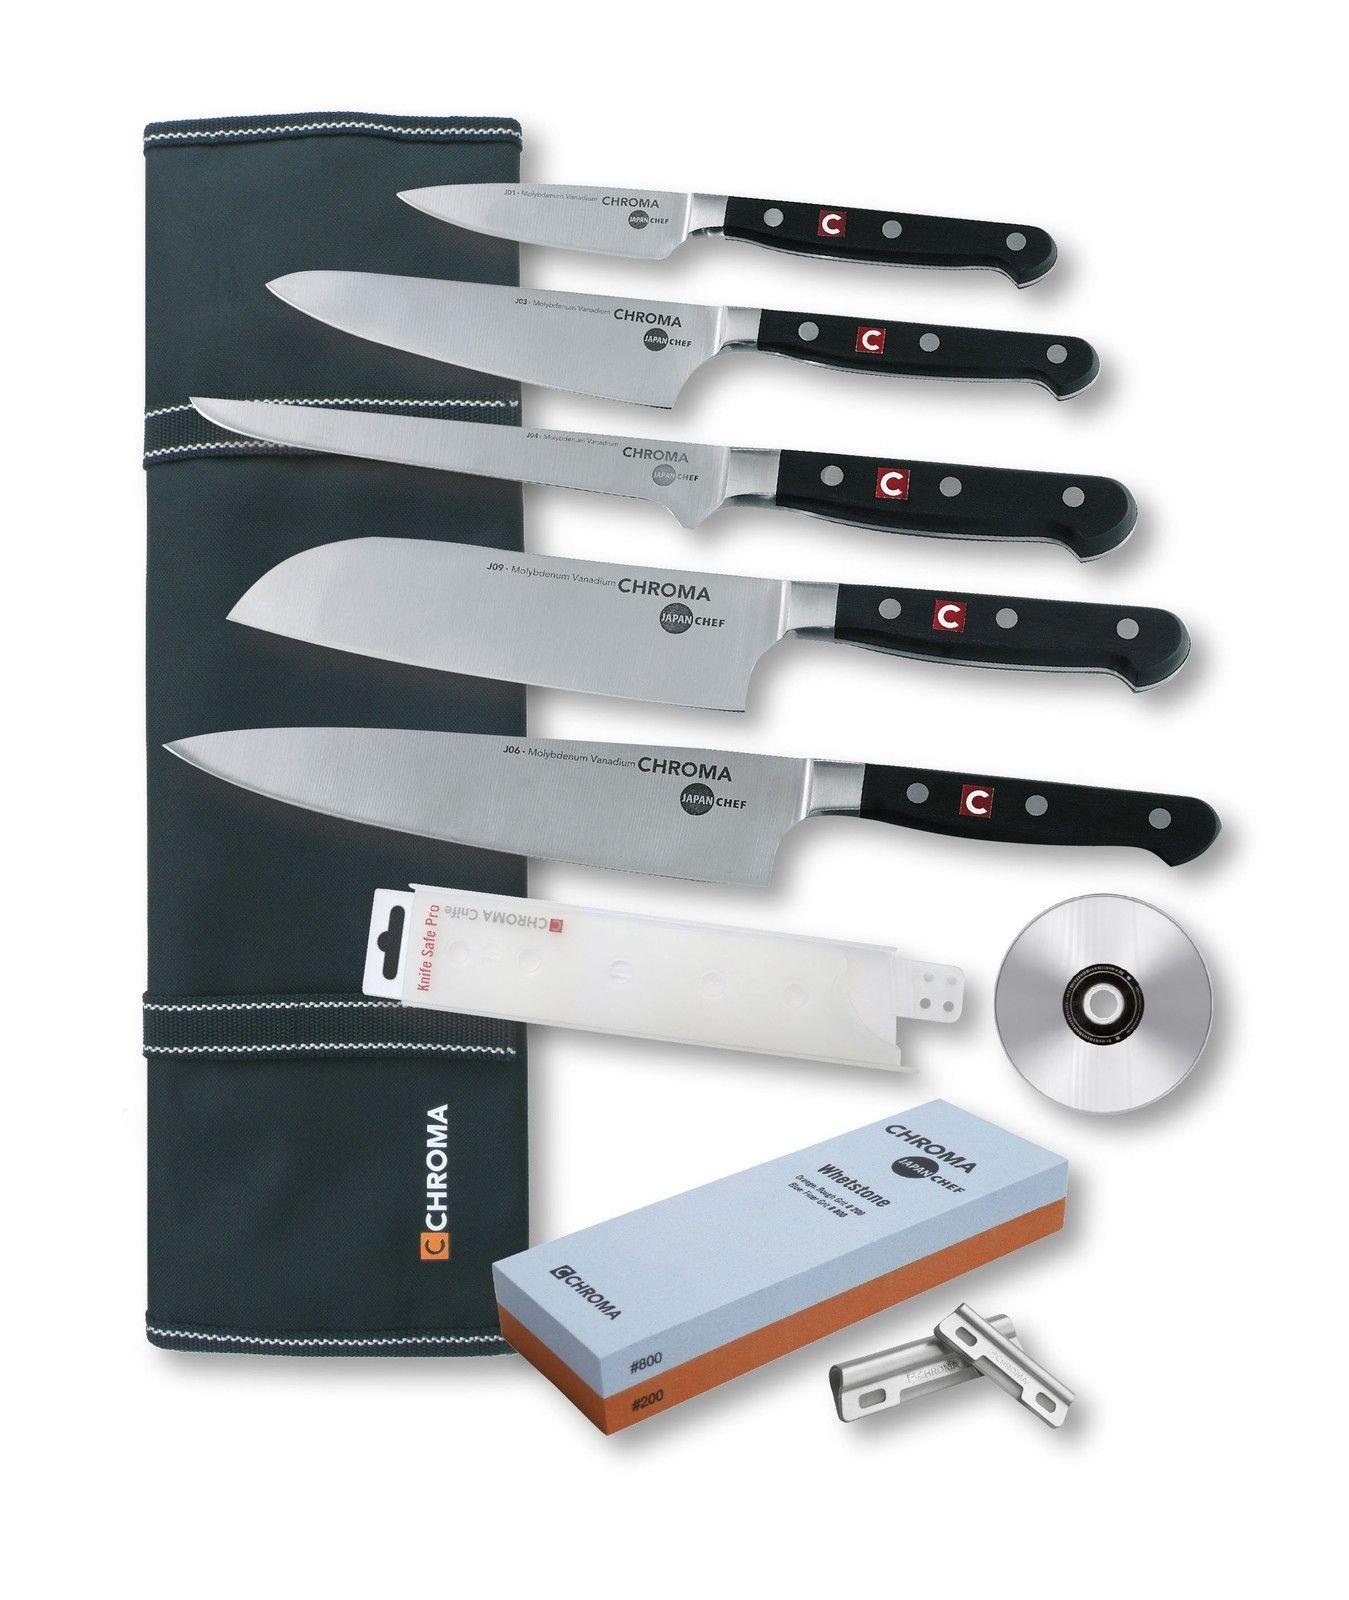 Chroma Japanchef Kochmesser Küchenmesser Set 10-teilig Azubi-Set neu ...